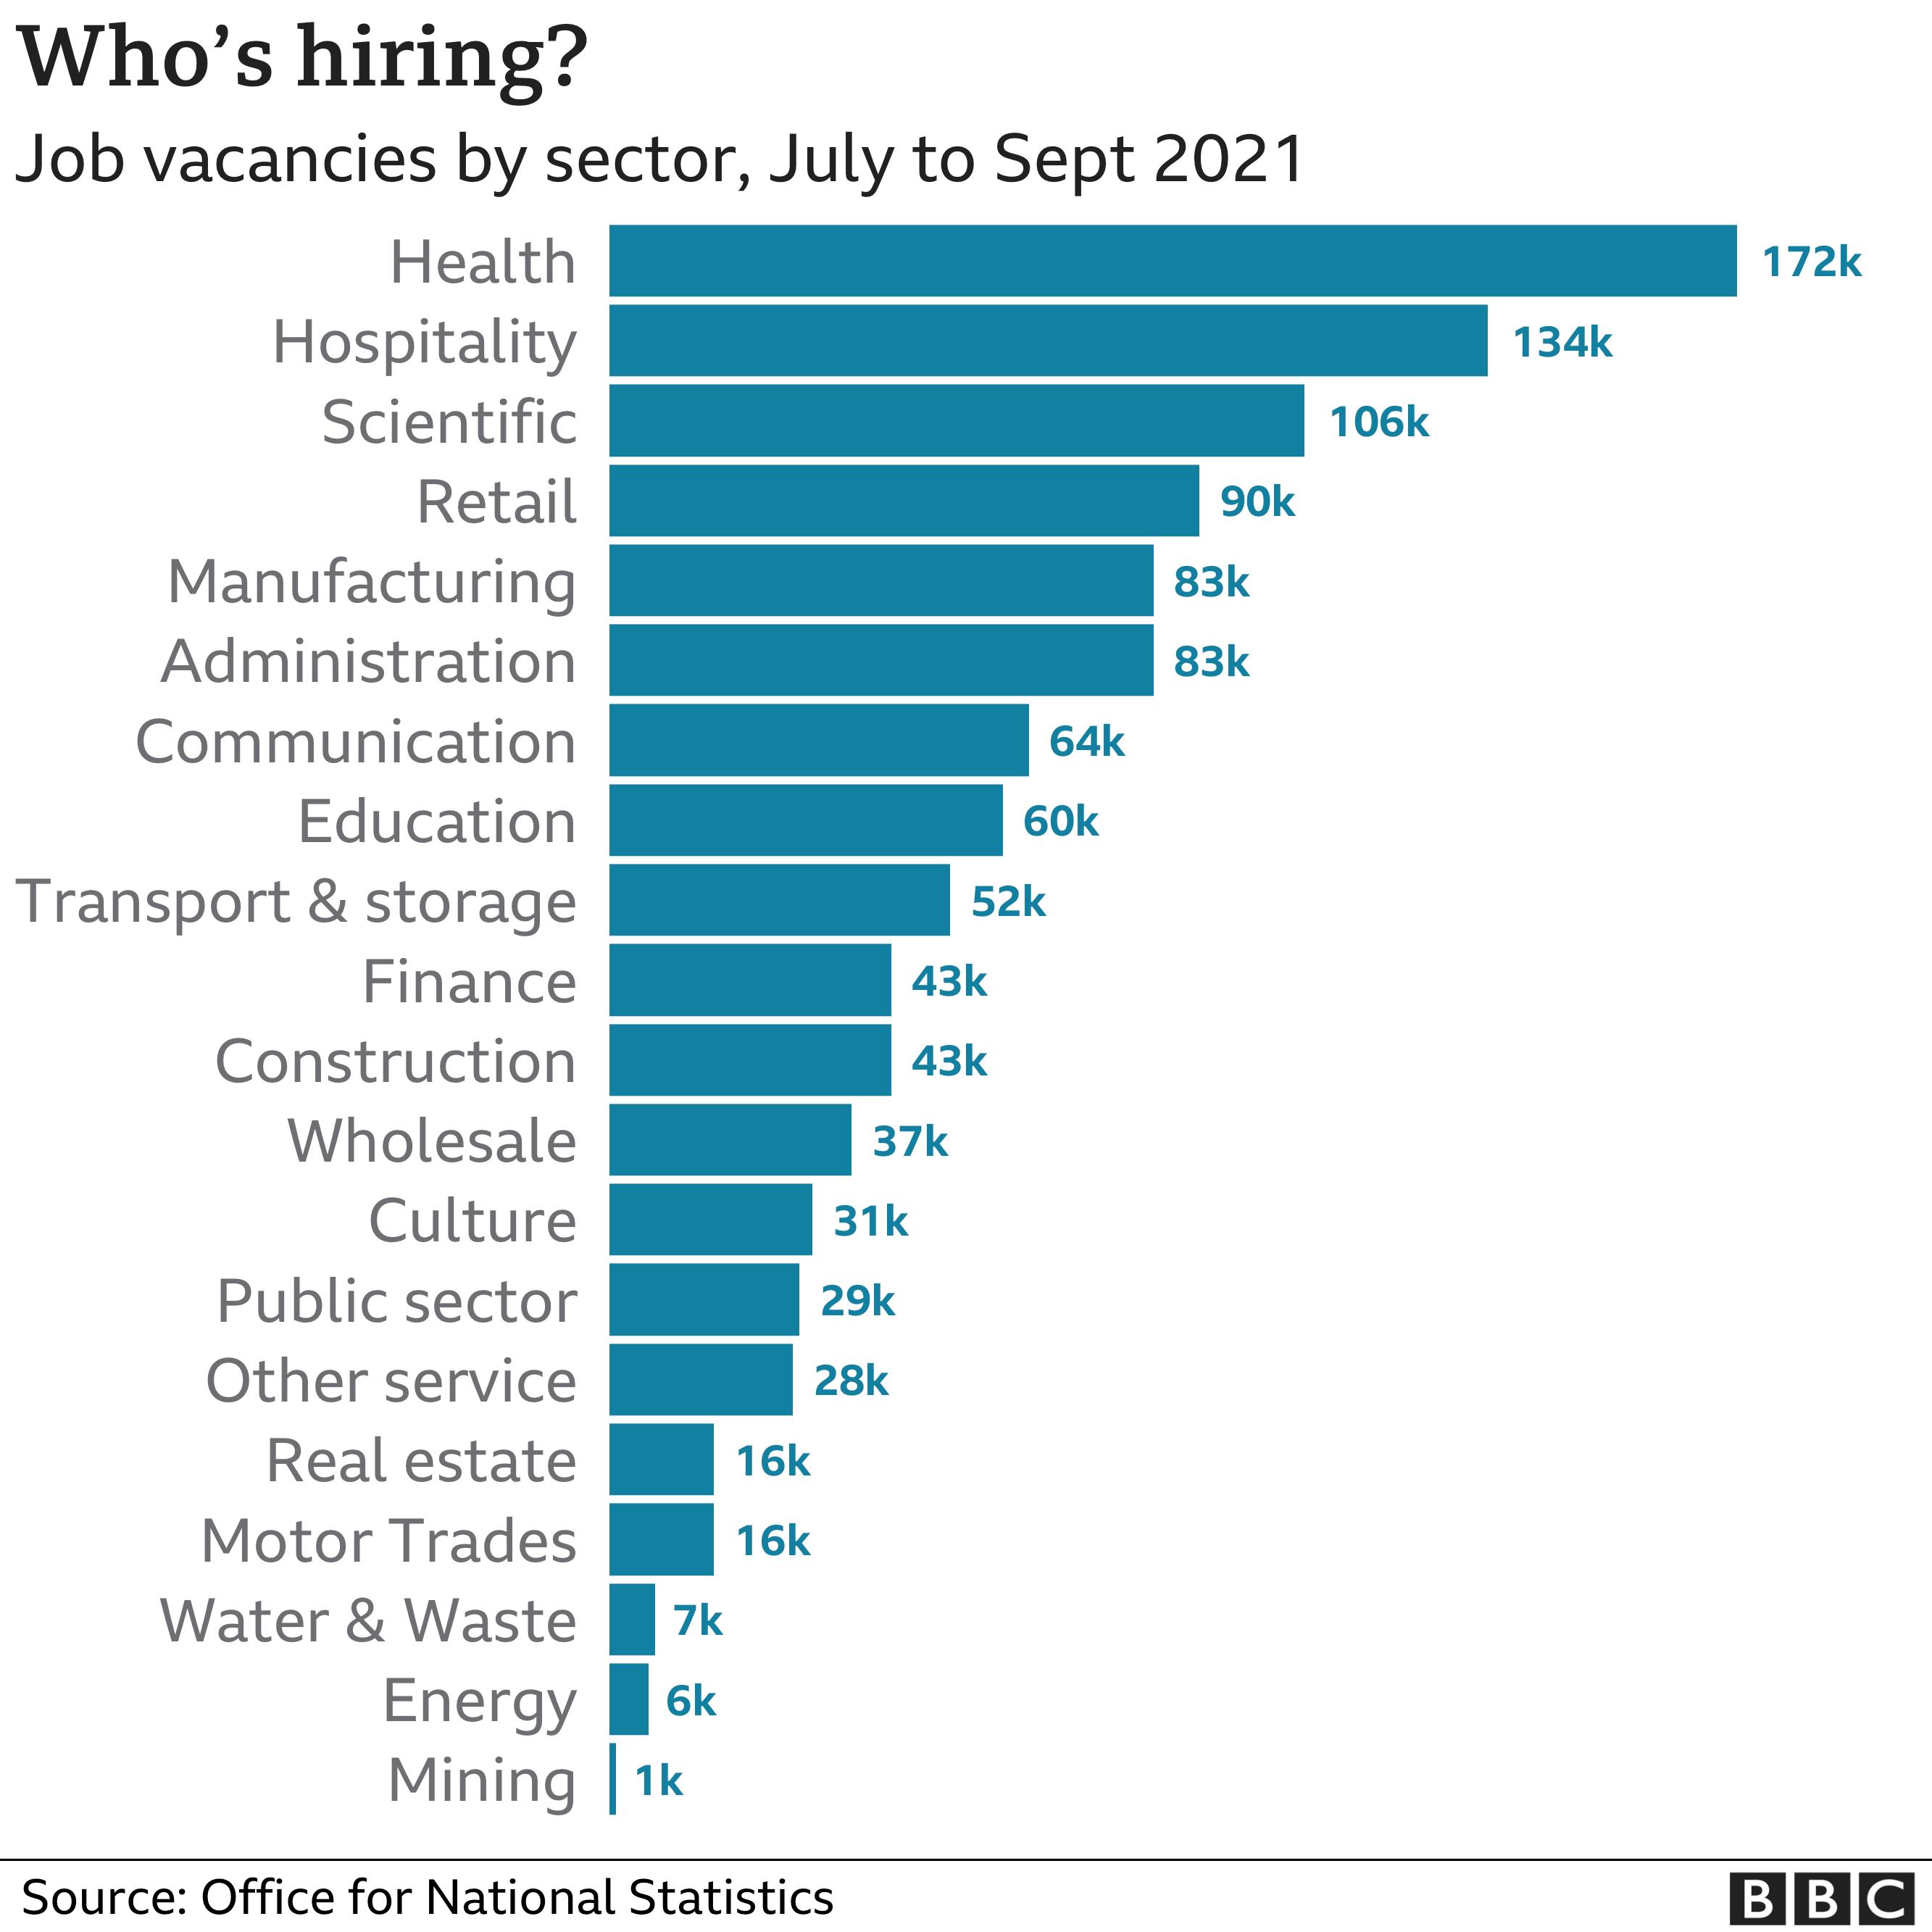 Chart showing job vacancies per sector, July to September 2021